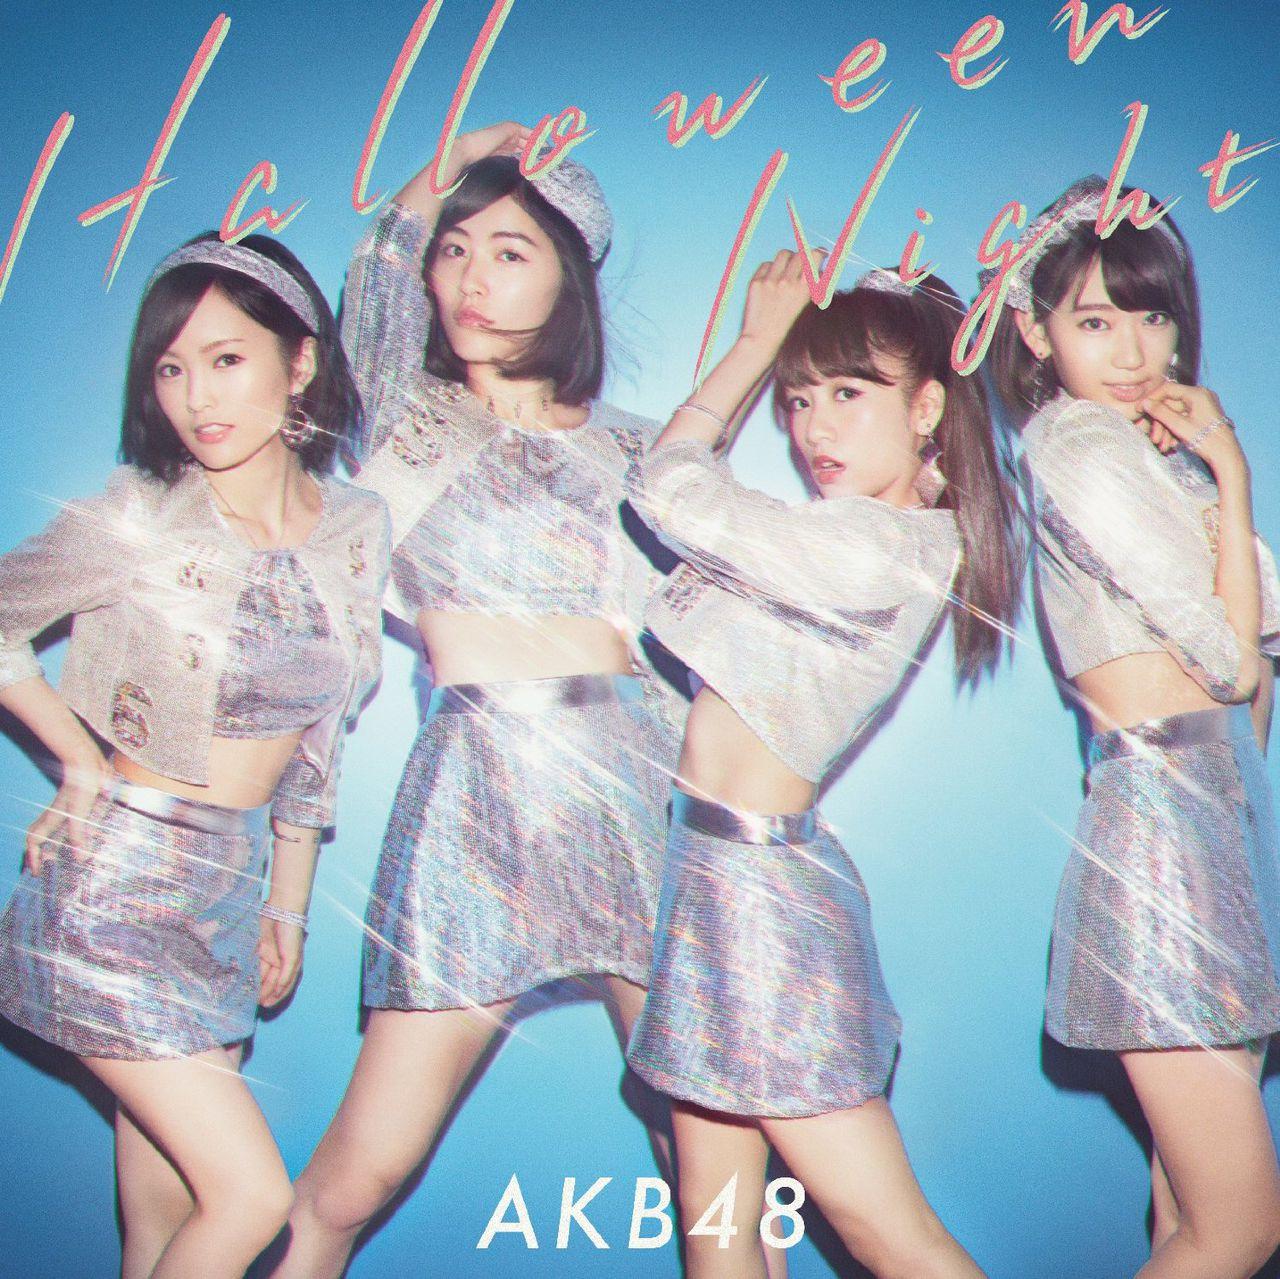 AKB48の画像 p1_16